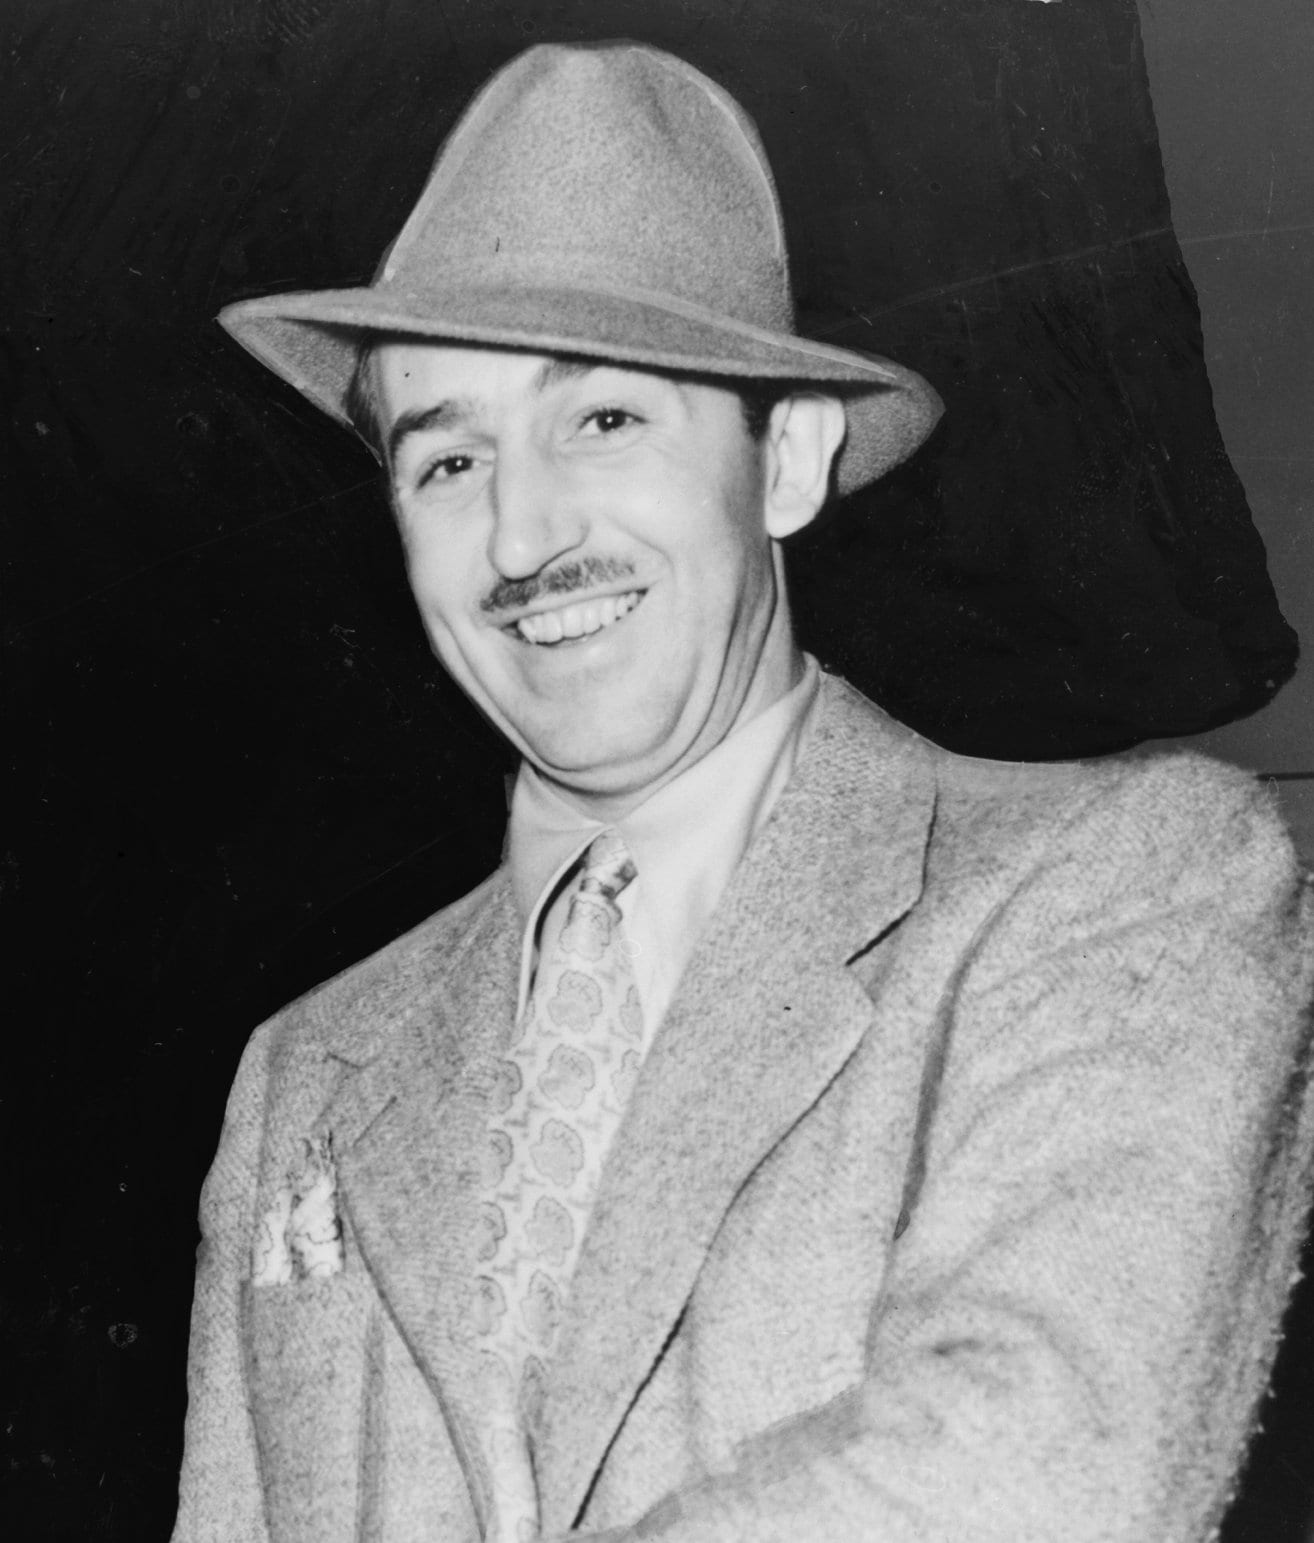 walt-disney-english-moustache-celebs-style